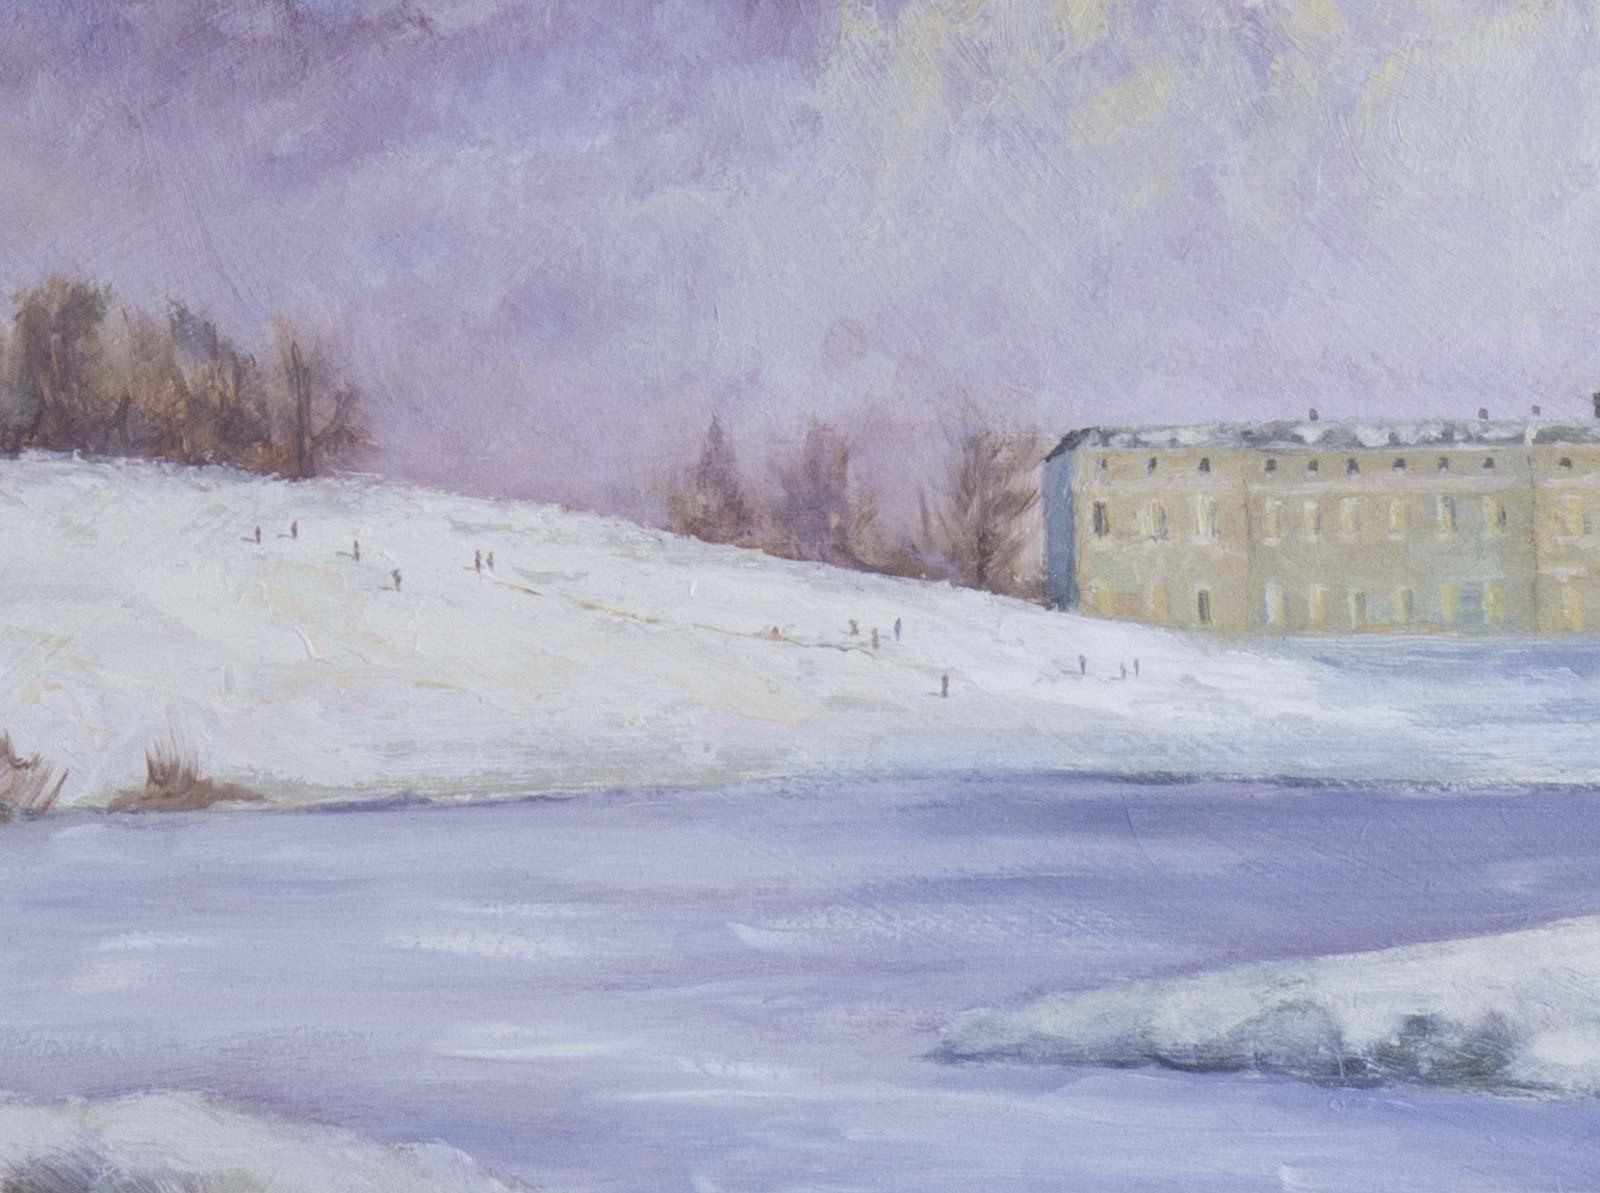 Snow in Petworth Park